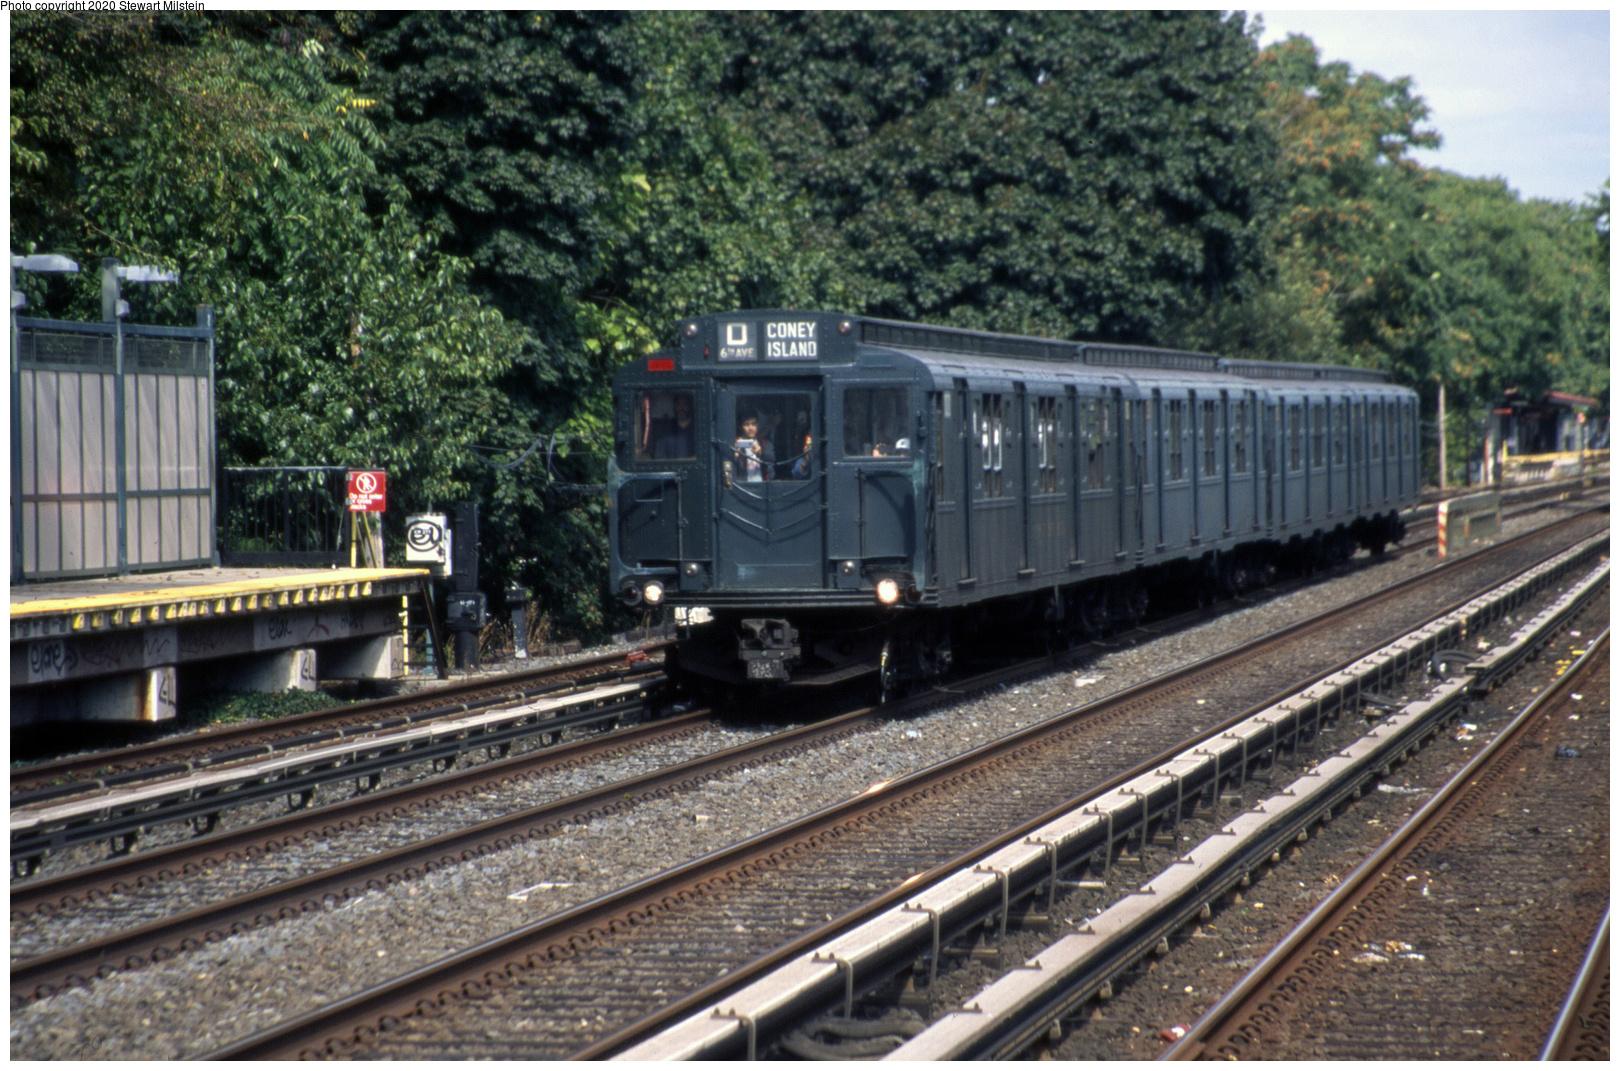 (881k, 1620x1071)<br><b>Country:</b> United States<br><b>City:</b> New York<br><b>System:</b> New York City Transit<br><b>Line:</b> BMT Brighton Line<br><b>Location:</b> Neck Road<br><b>Route:</b> Museum Train Service<br><b>Car:</b> R-1 (American Car & Foundry, 1930-1931) 100 <br><b>Photo by:</b> Stewart Milstein<br><b>Date:</b> 9/28/2019<br><b>Viewed (this week/total):</b> 0 / 207